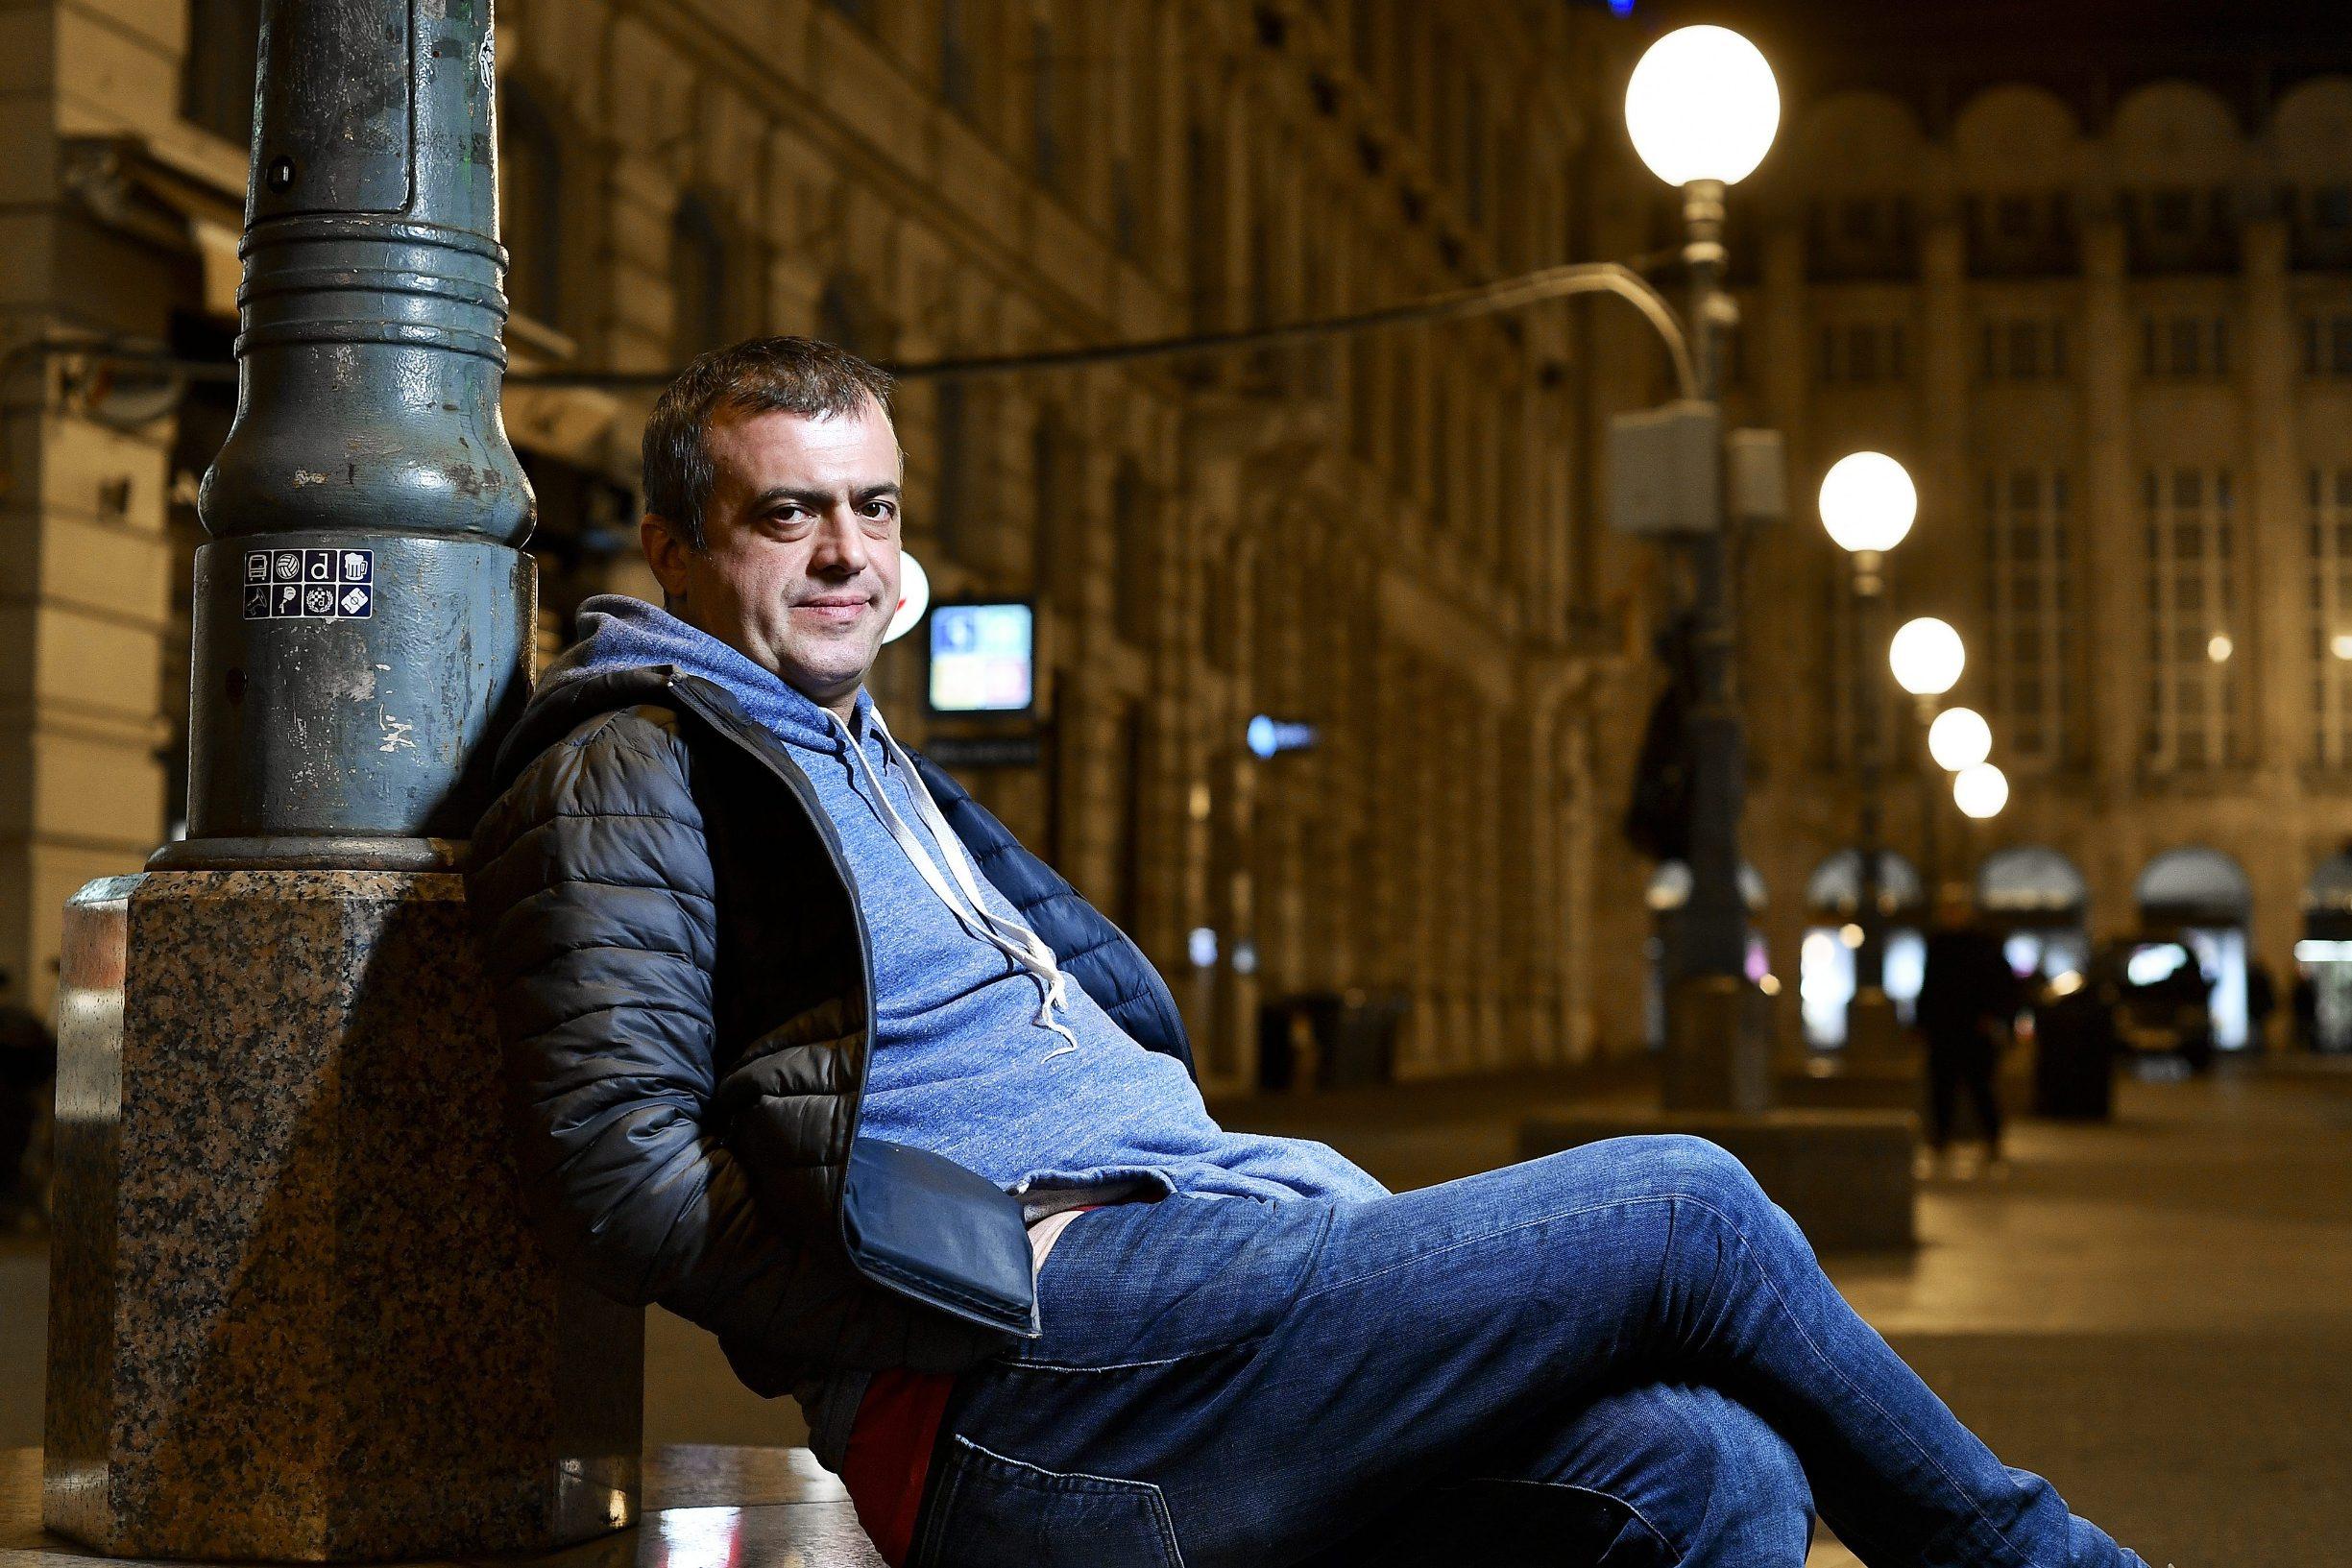 Zagreb, 280219. Srpski glumac Sergej Trifunovic, fotografiran u Bogovicevoj ulici. Foto: Boris Kovacev / CROPIX